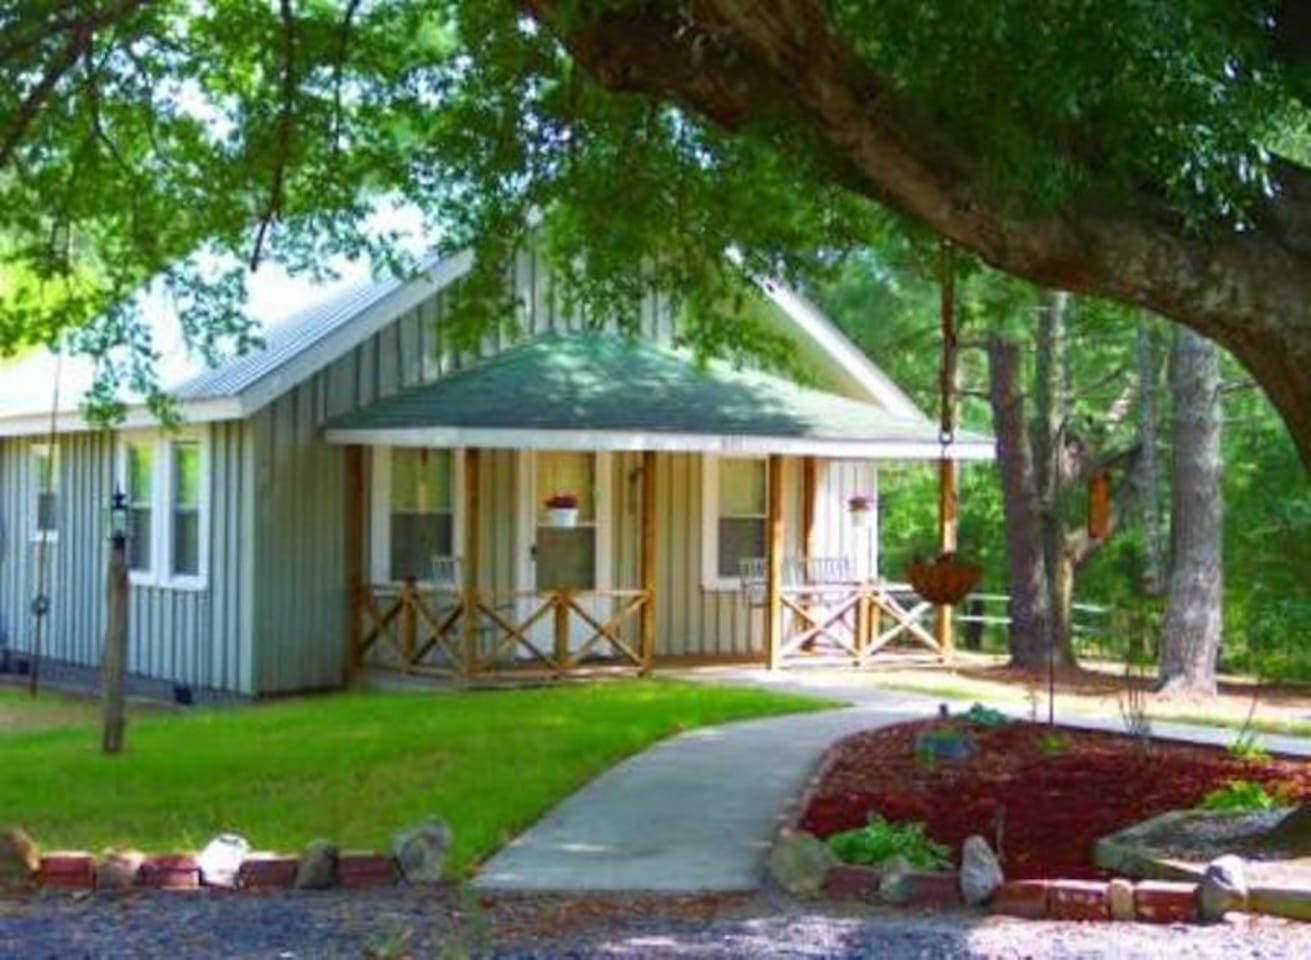 Juniper Pines Cottage front view